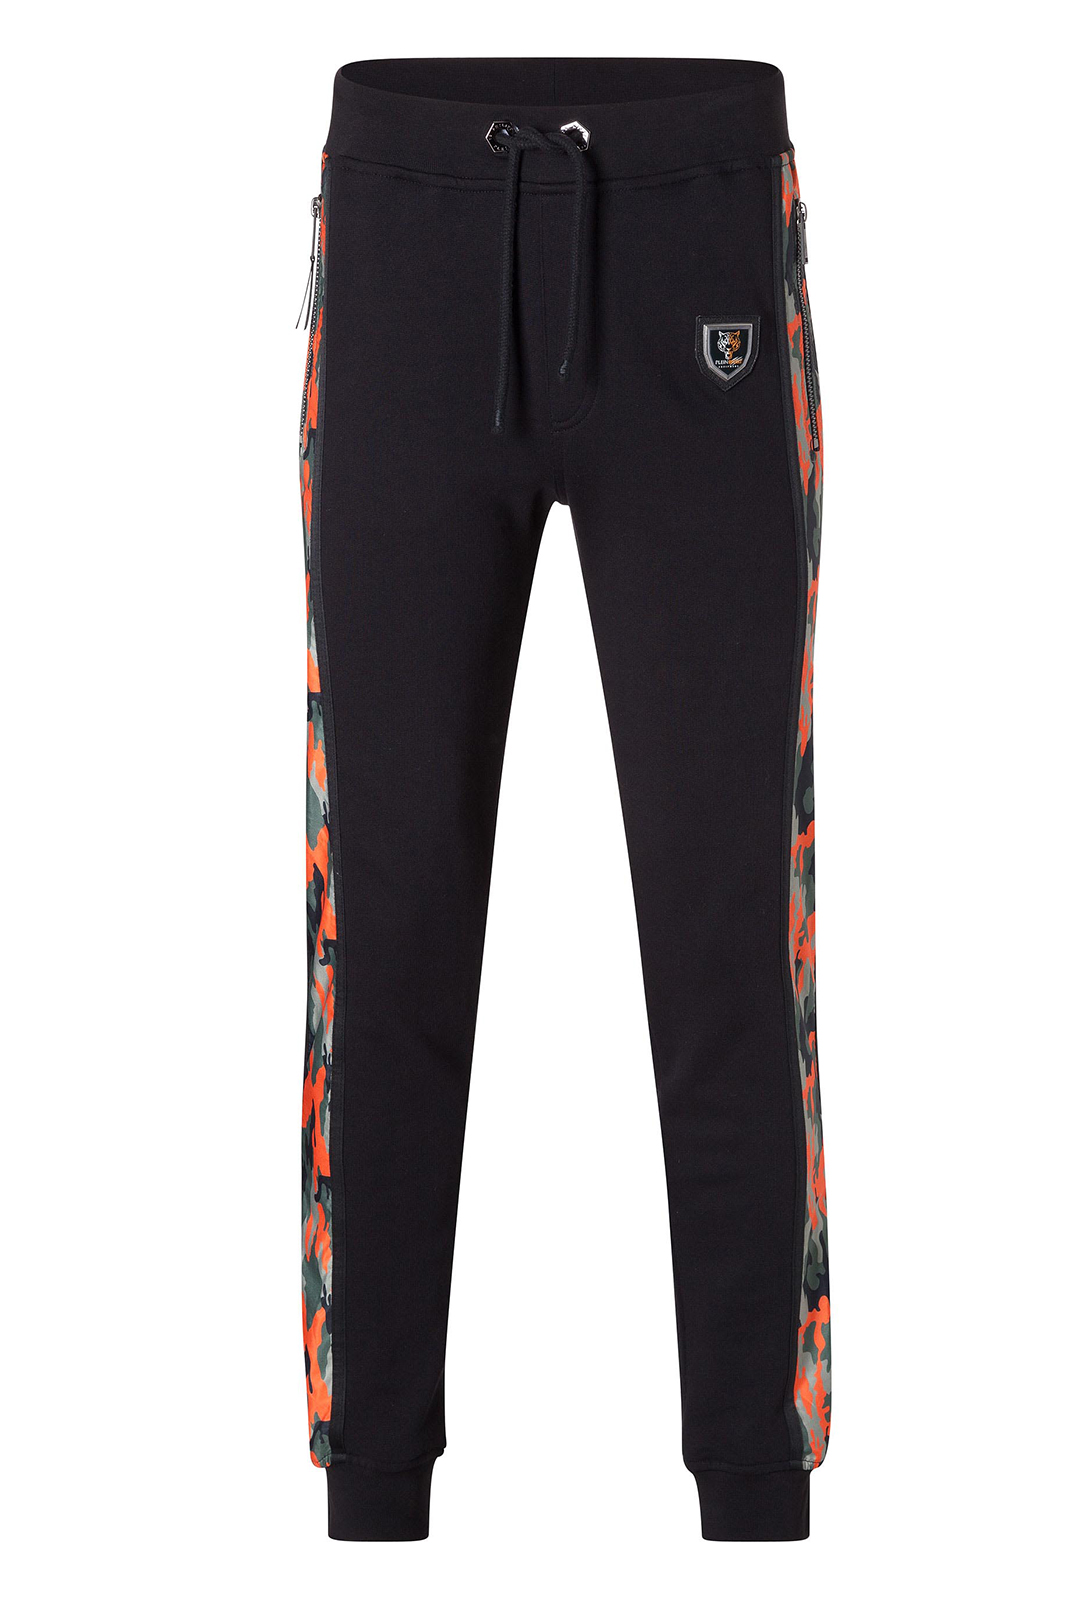 Pantalons sport/streetwear  Plein Sport P17C MJT0116 02O4 BLACK ORANGE